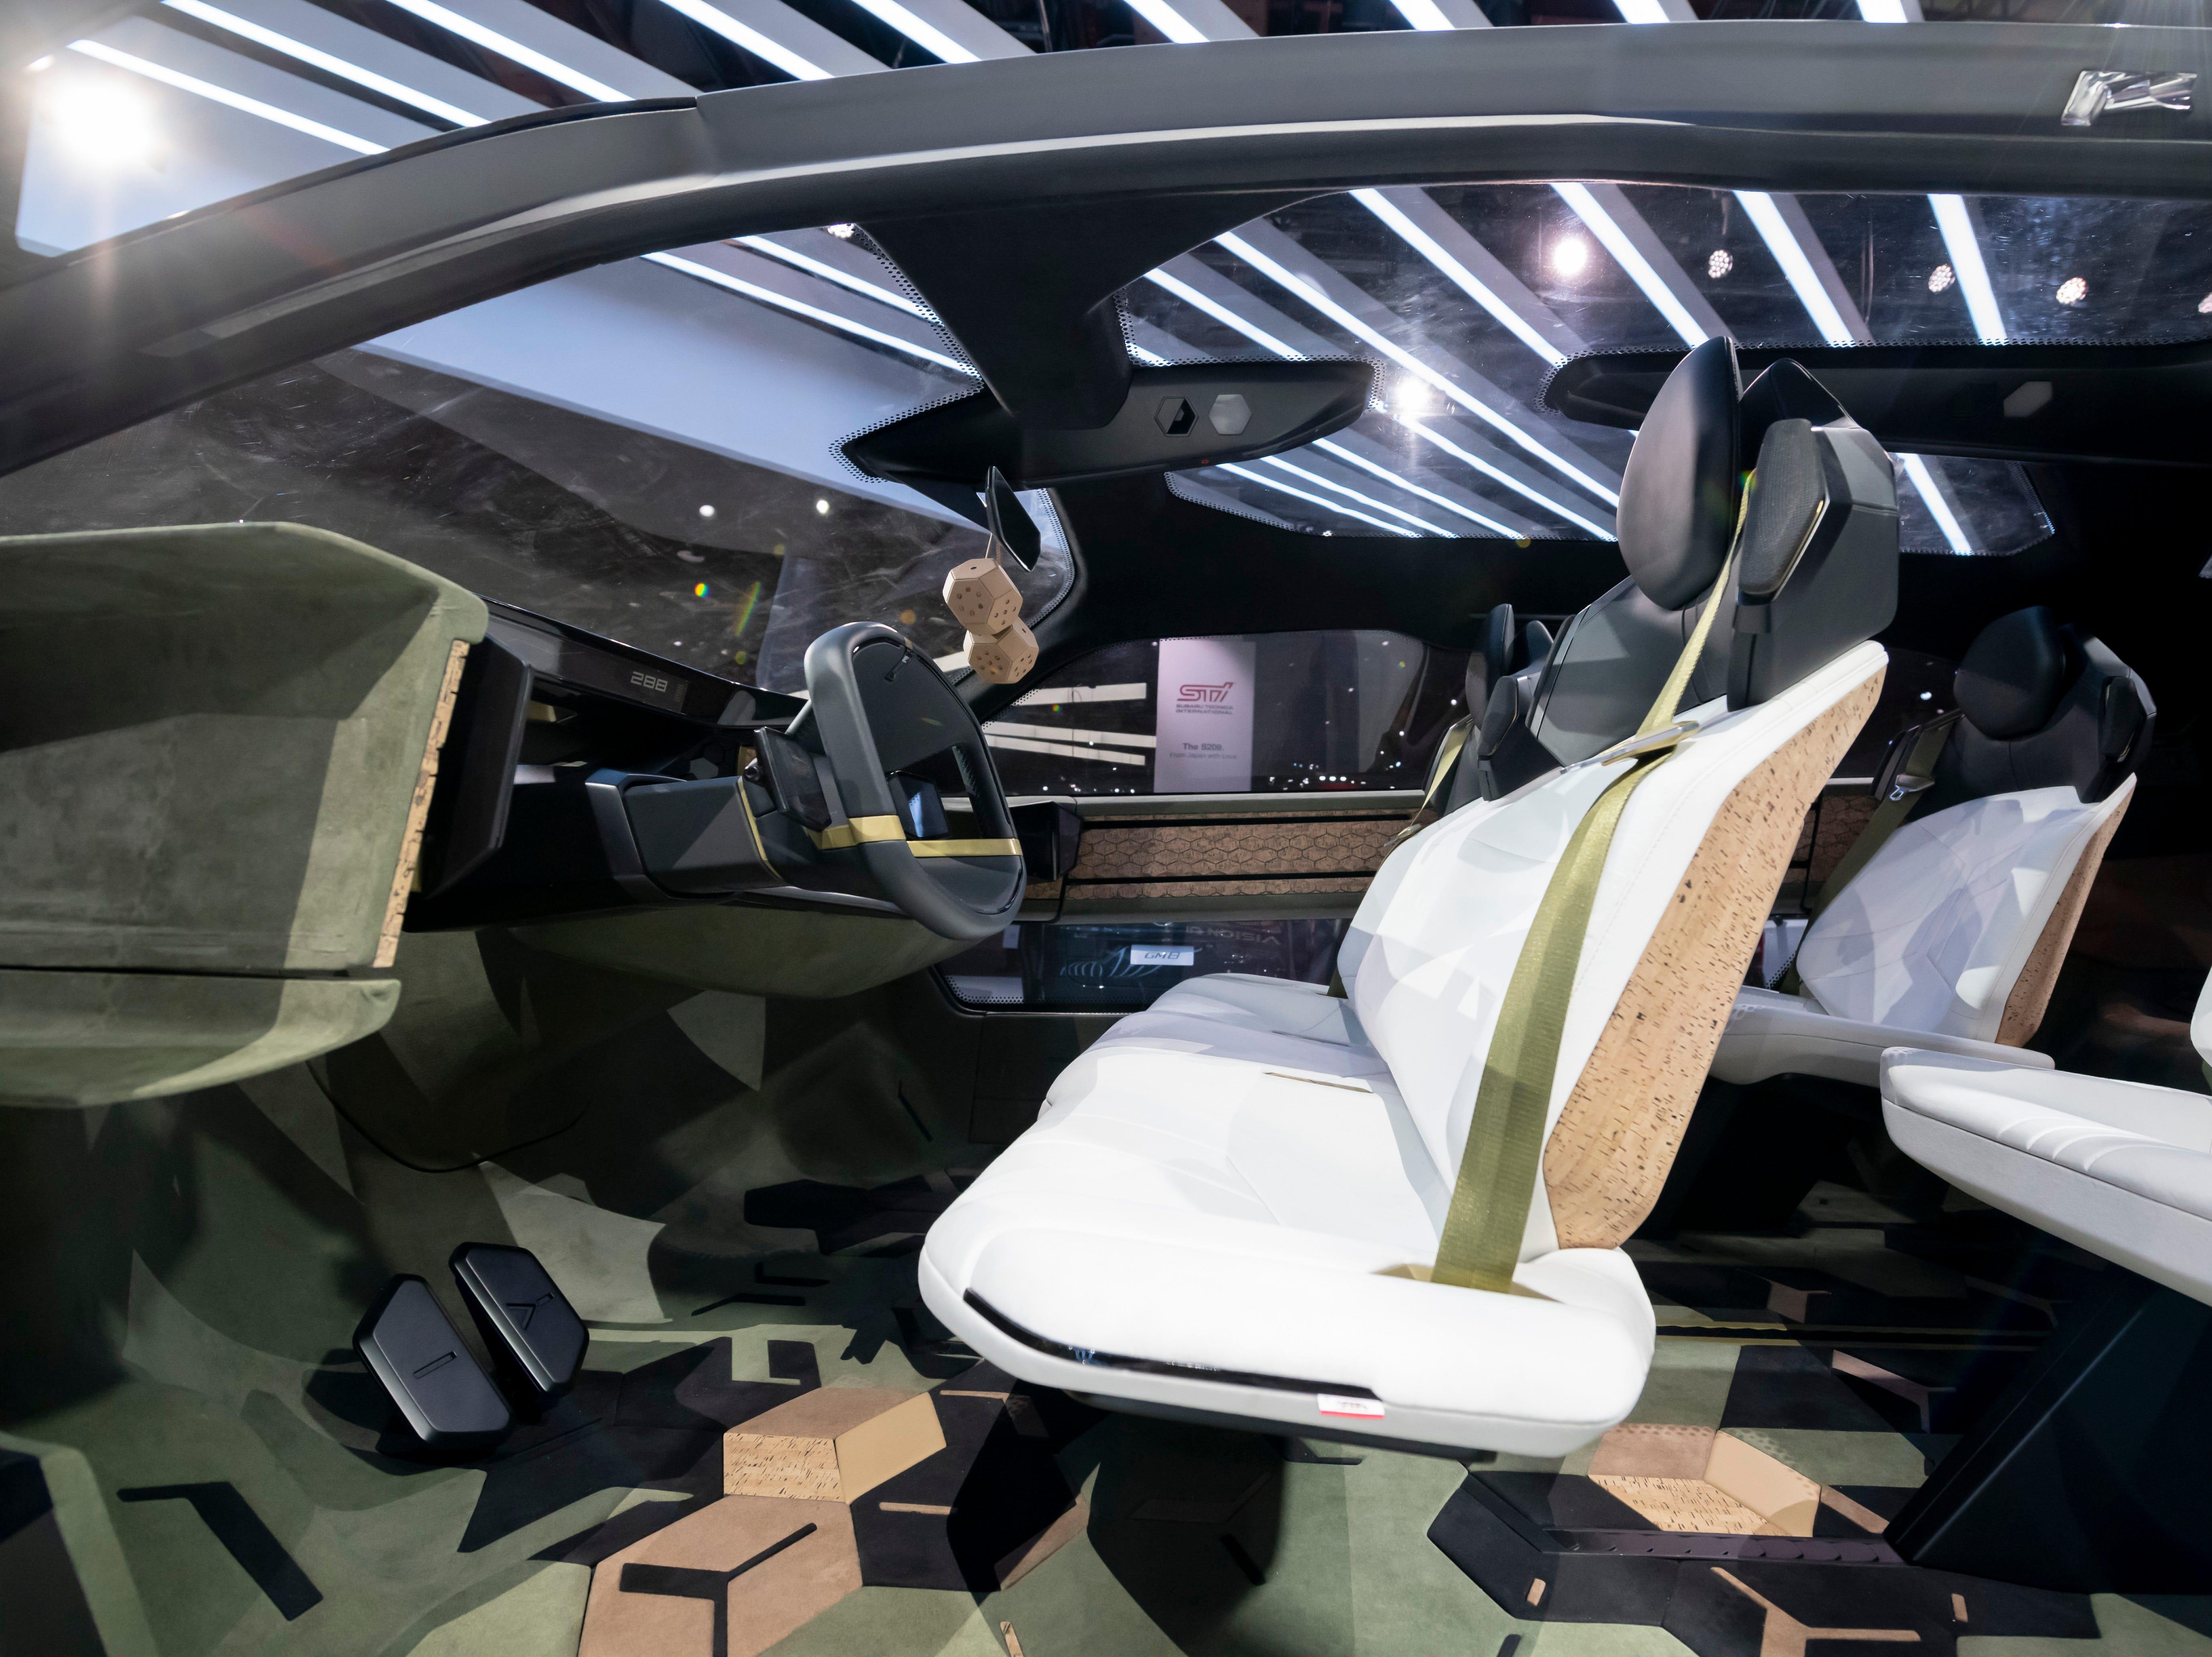 The interior of the GAC Entranze concept vehicle.